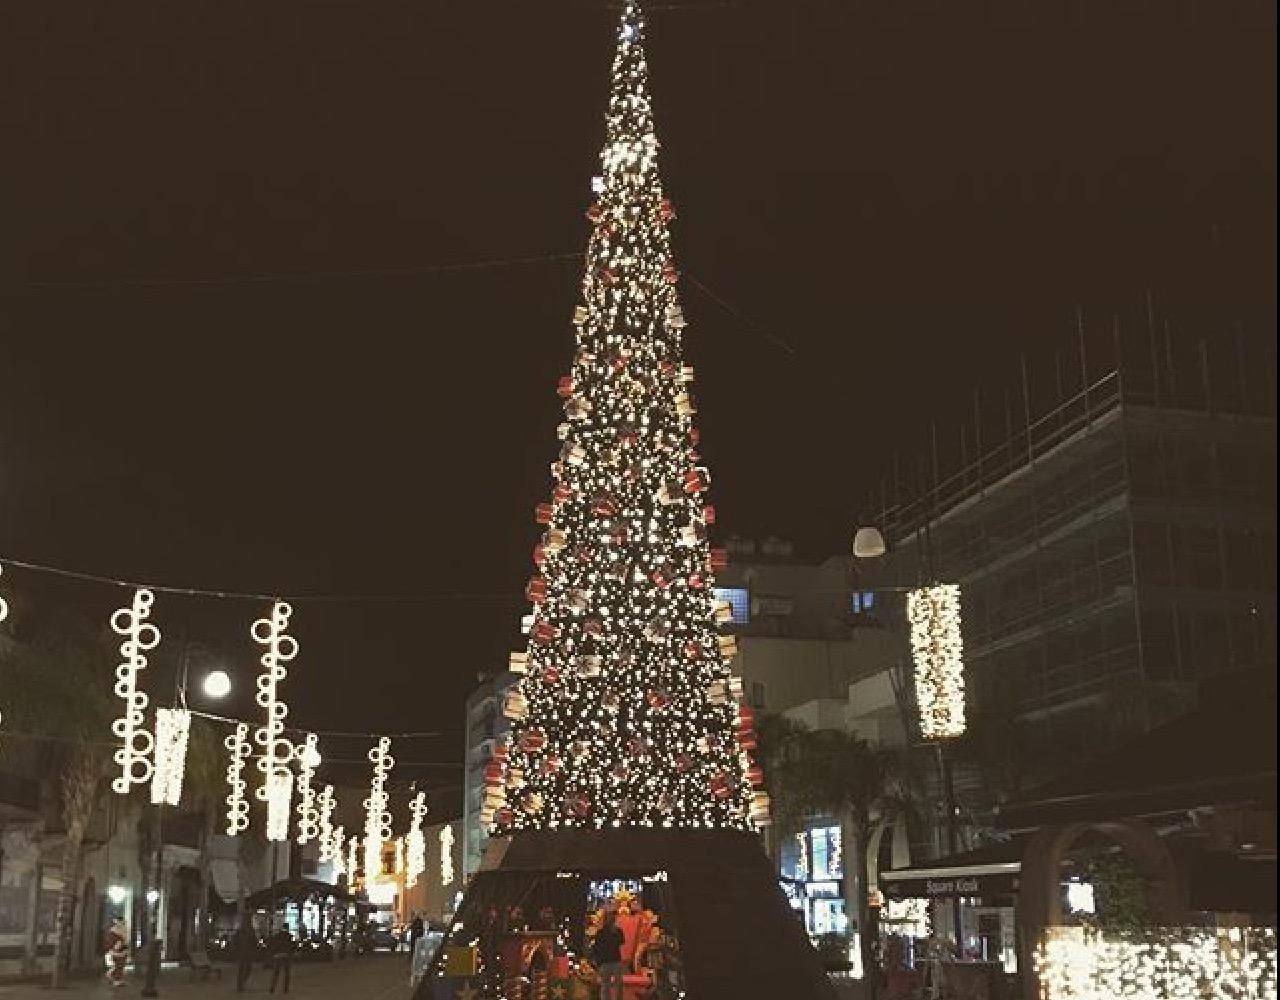 Tα πιο μαγικά Χριστούγεννα στην Λάρνακα με Βίσση, Παπαρίζου, Χατζηγιάννη & Καλλίρη!